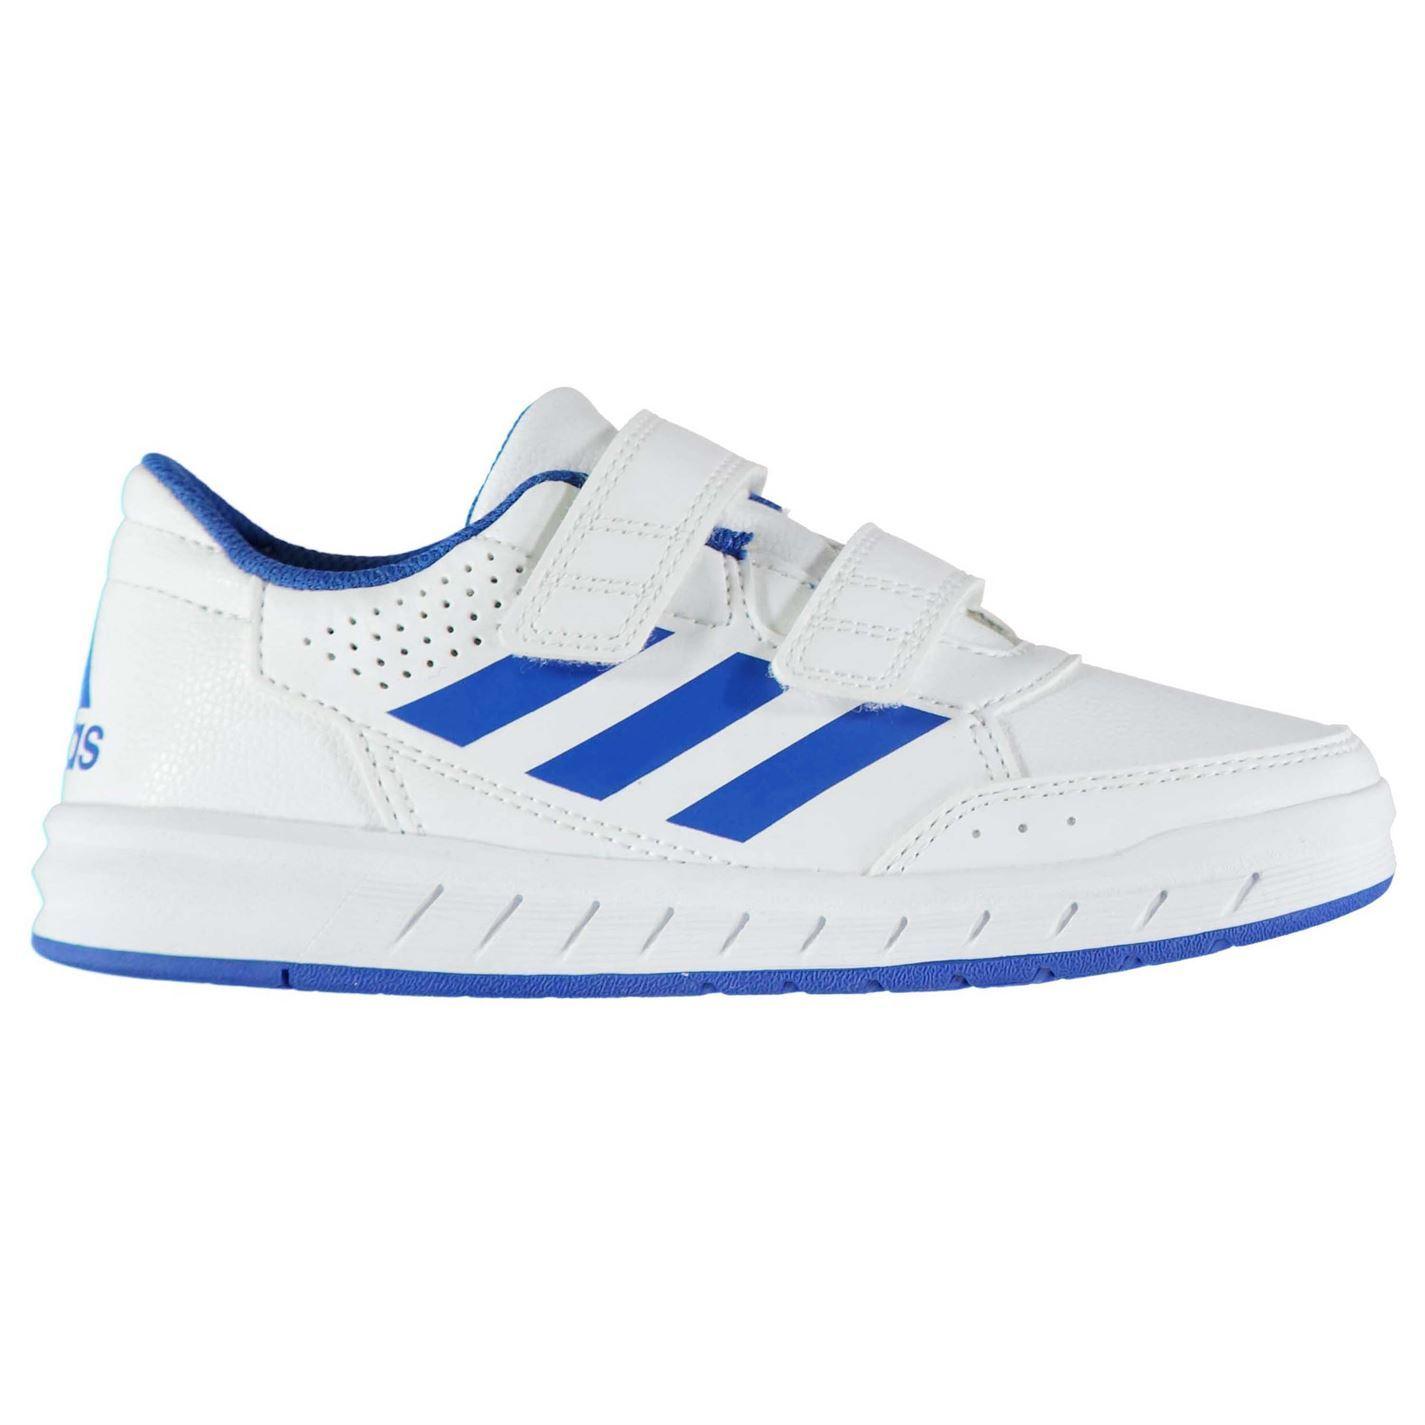 miniatura 18 - ADIDAS-alta-Sport-CF-Scarpe-da-ginnastica-bambino-ragazzo-calzature